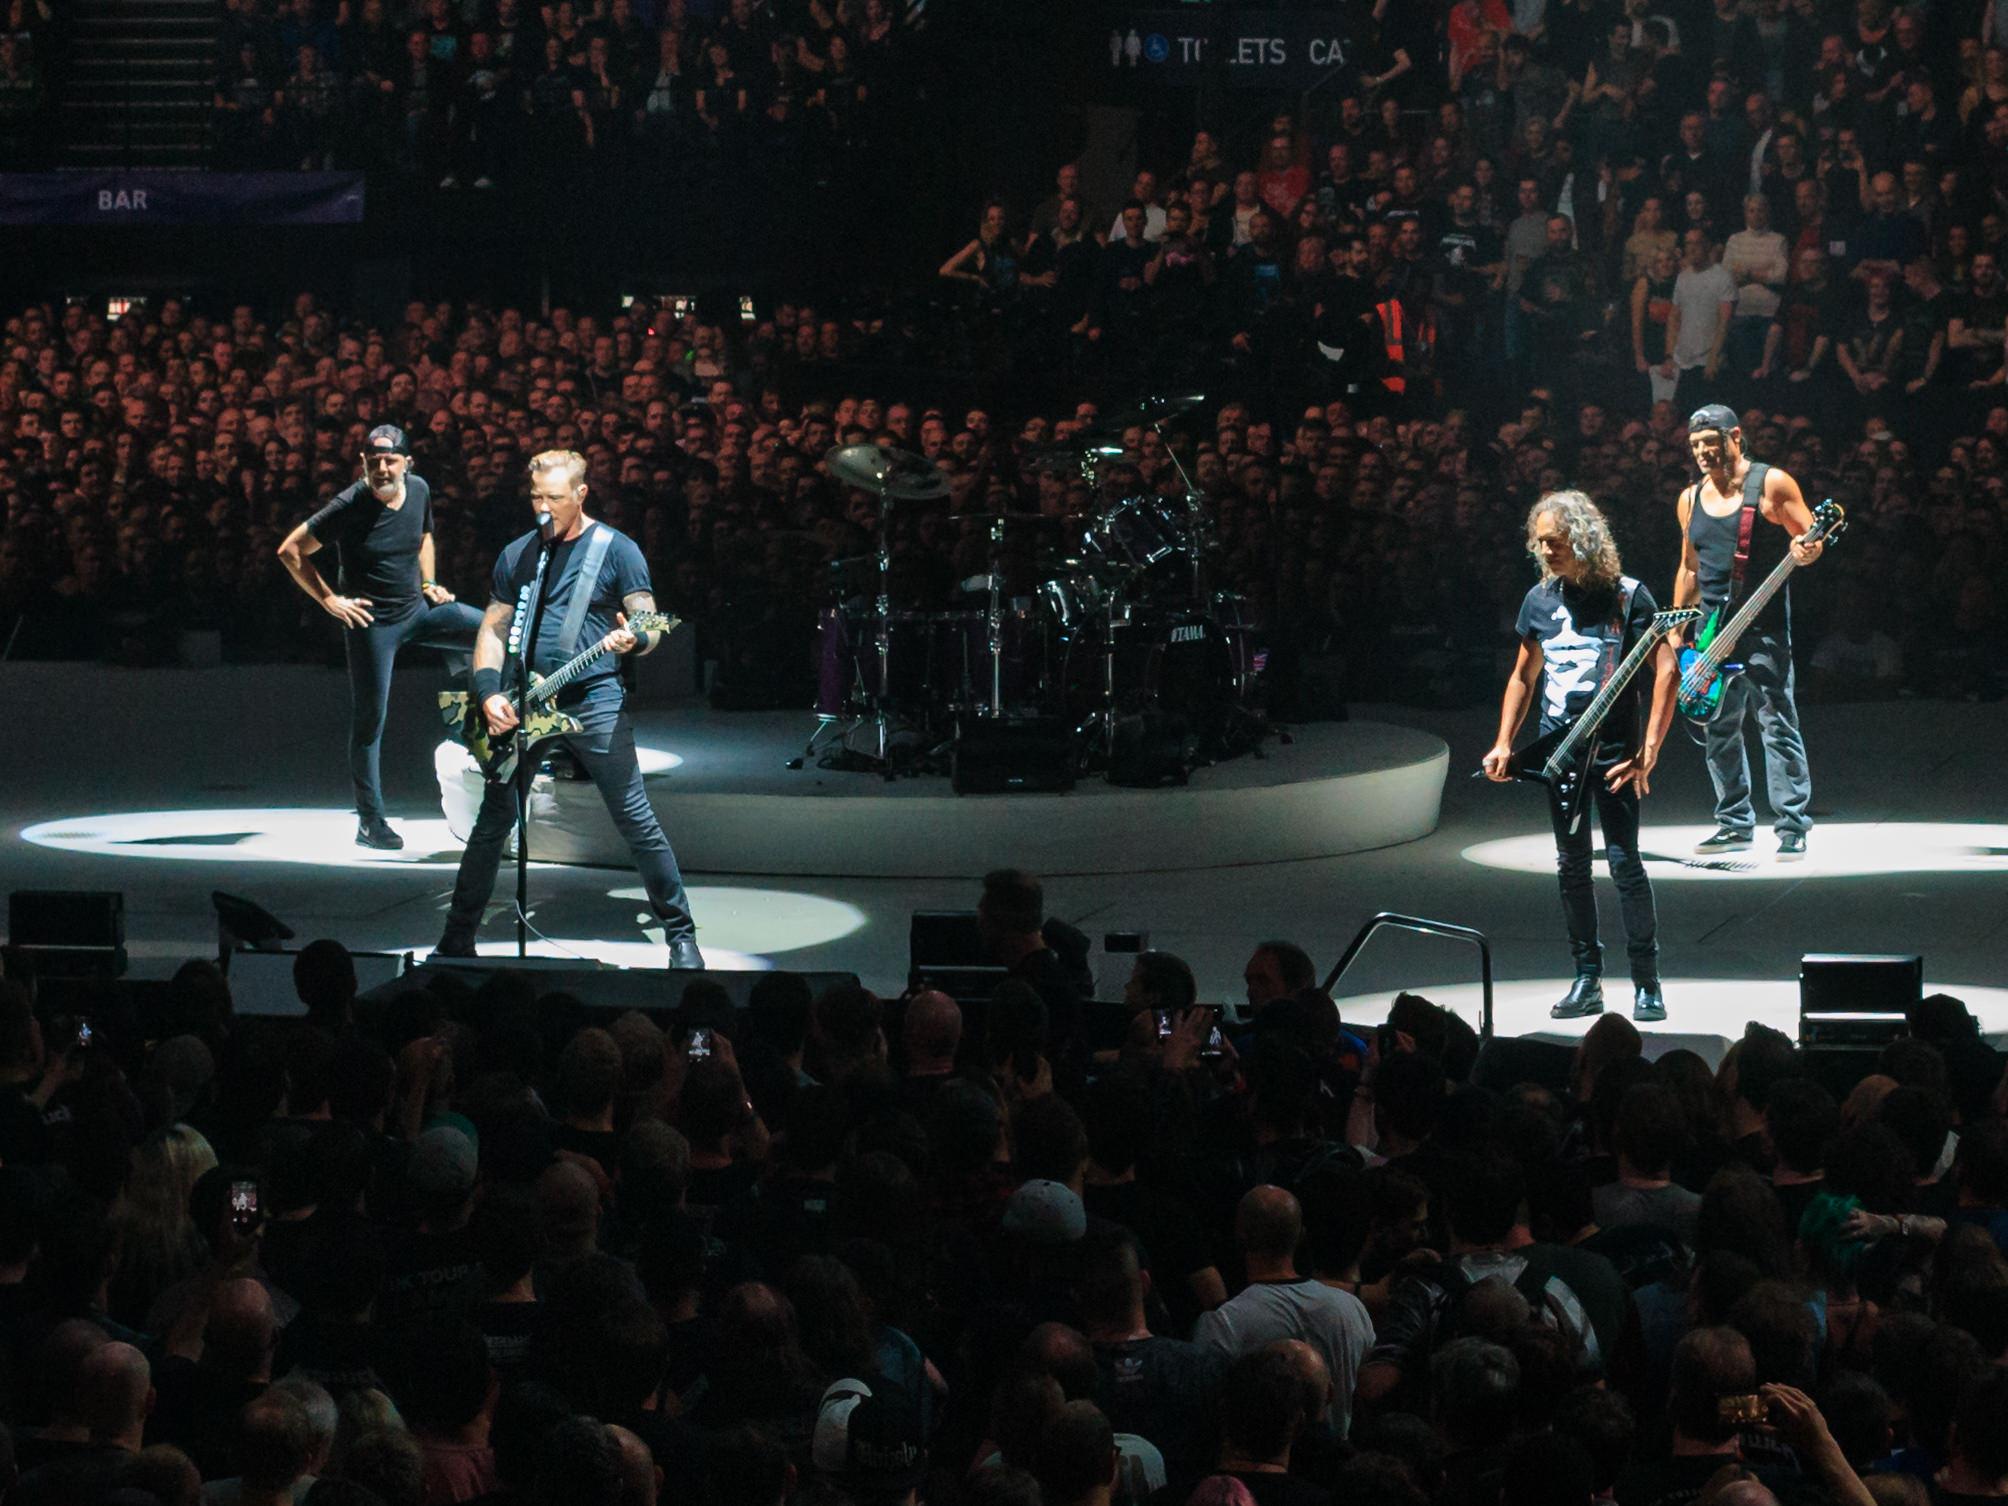 Metallica_Live_at_The_O2,_London,_England,_22_October_2017.jpg